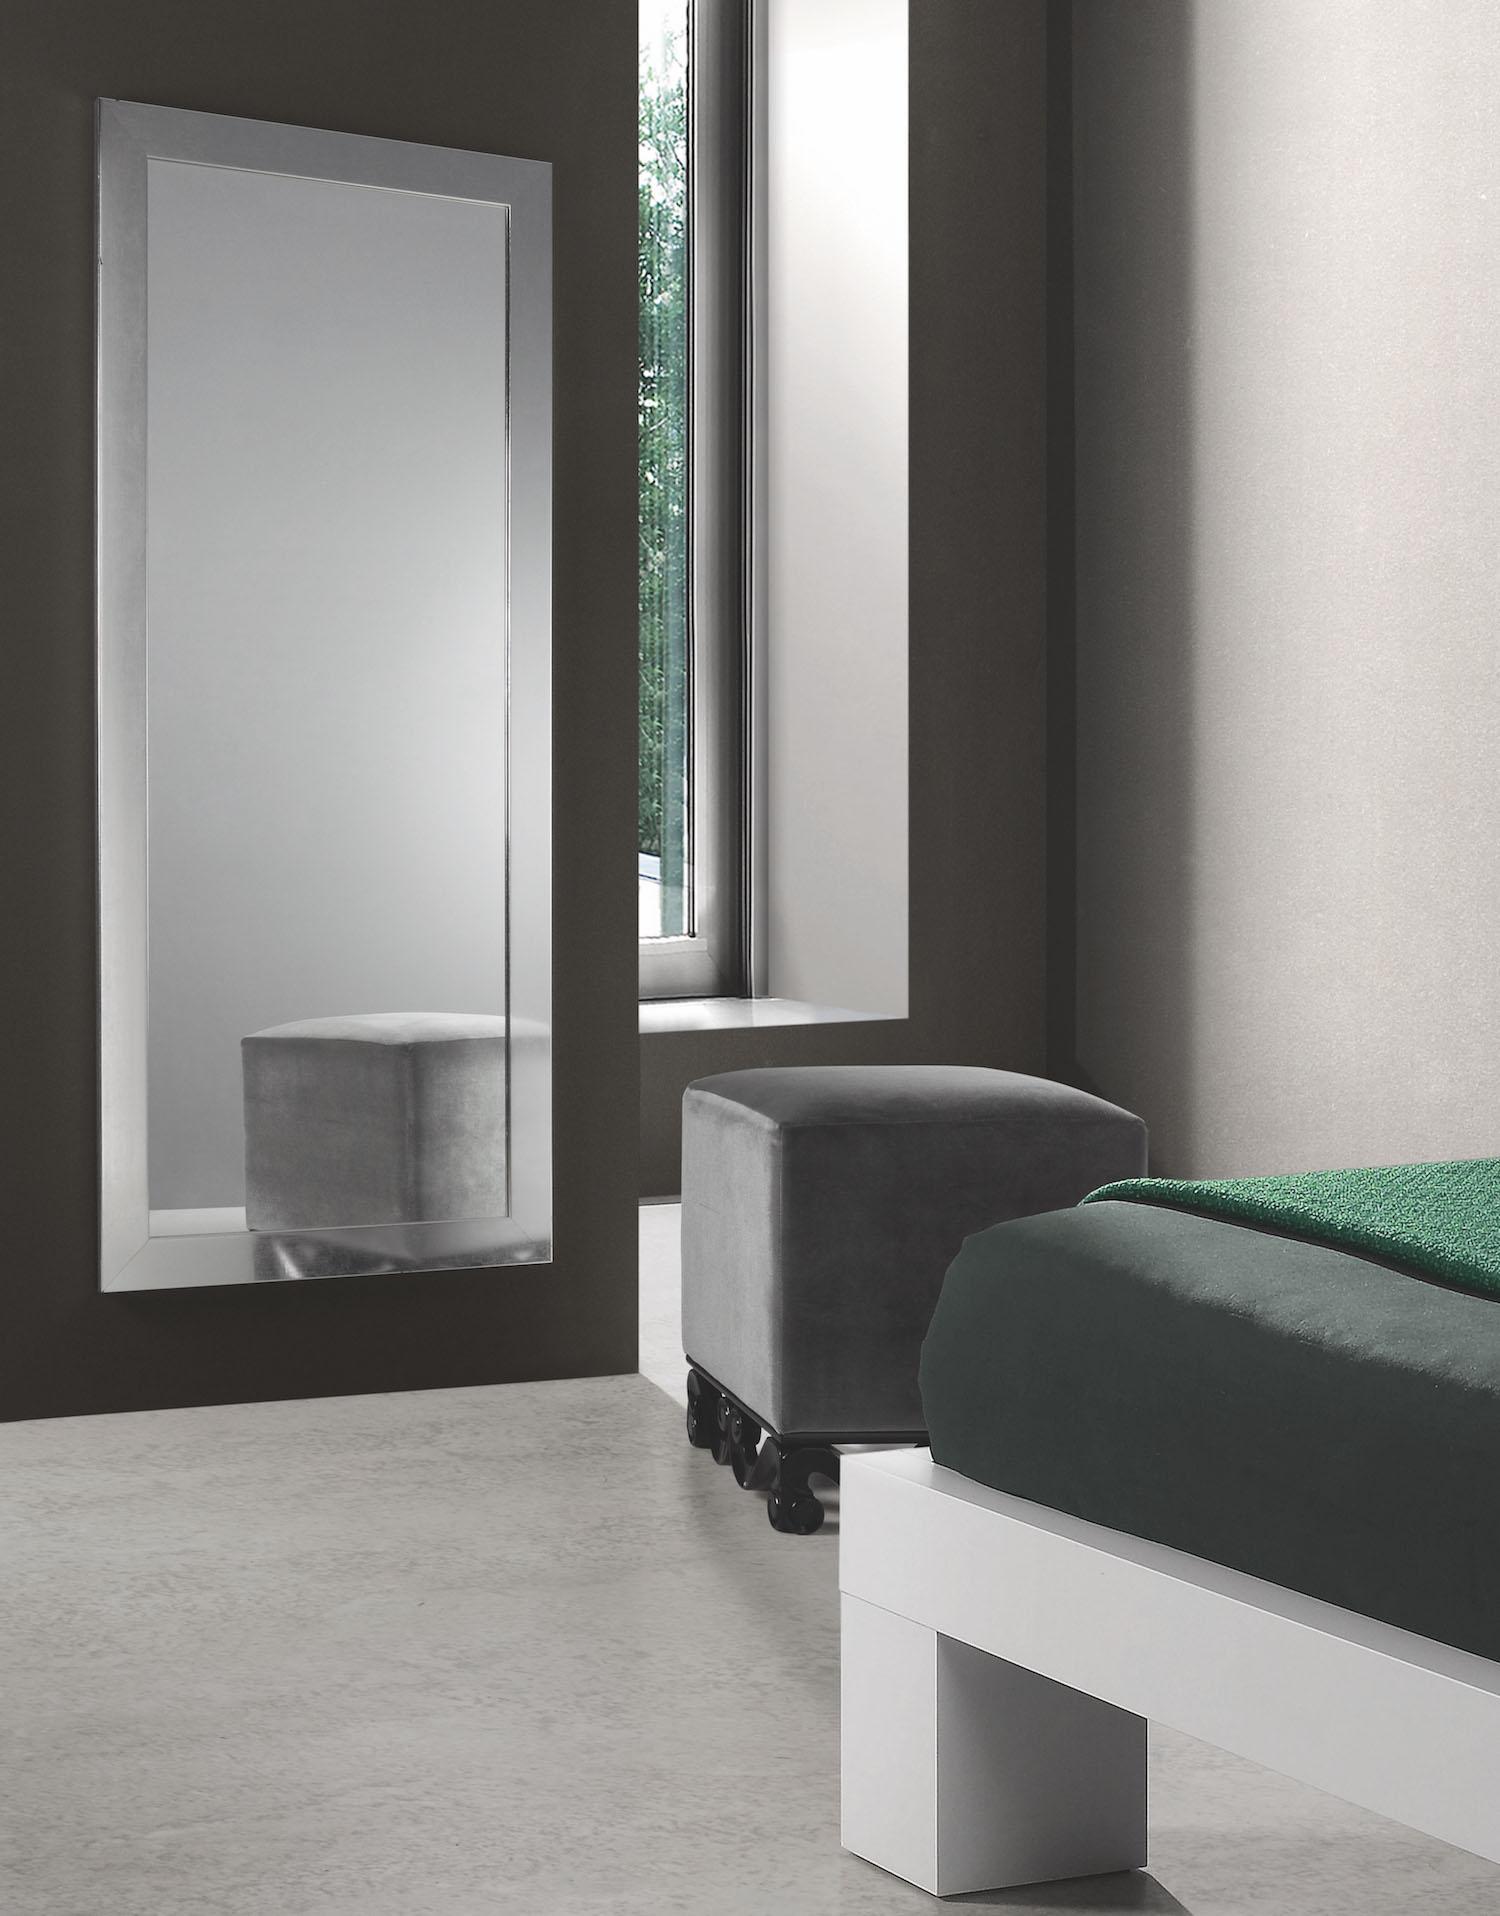 Espejo square muebles vinaroz for Espejo 5mm precio